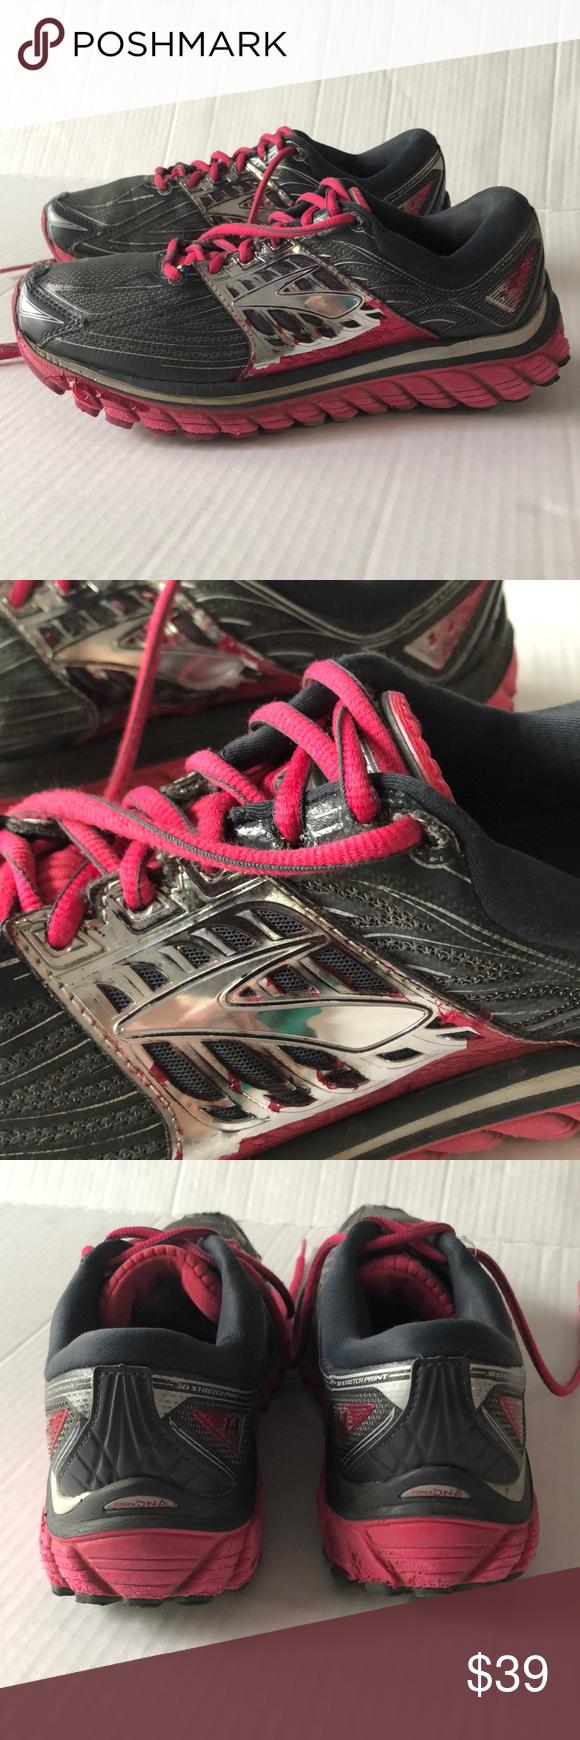 carpe runem shoes free shipping 449a0 013f4